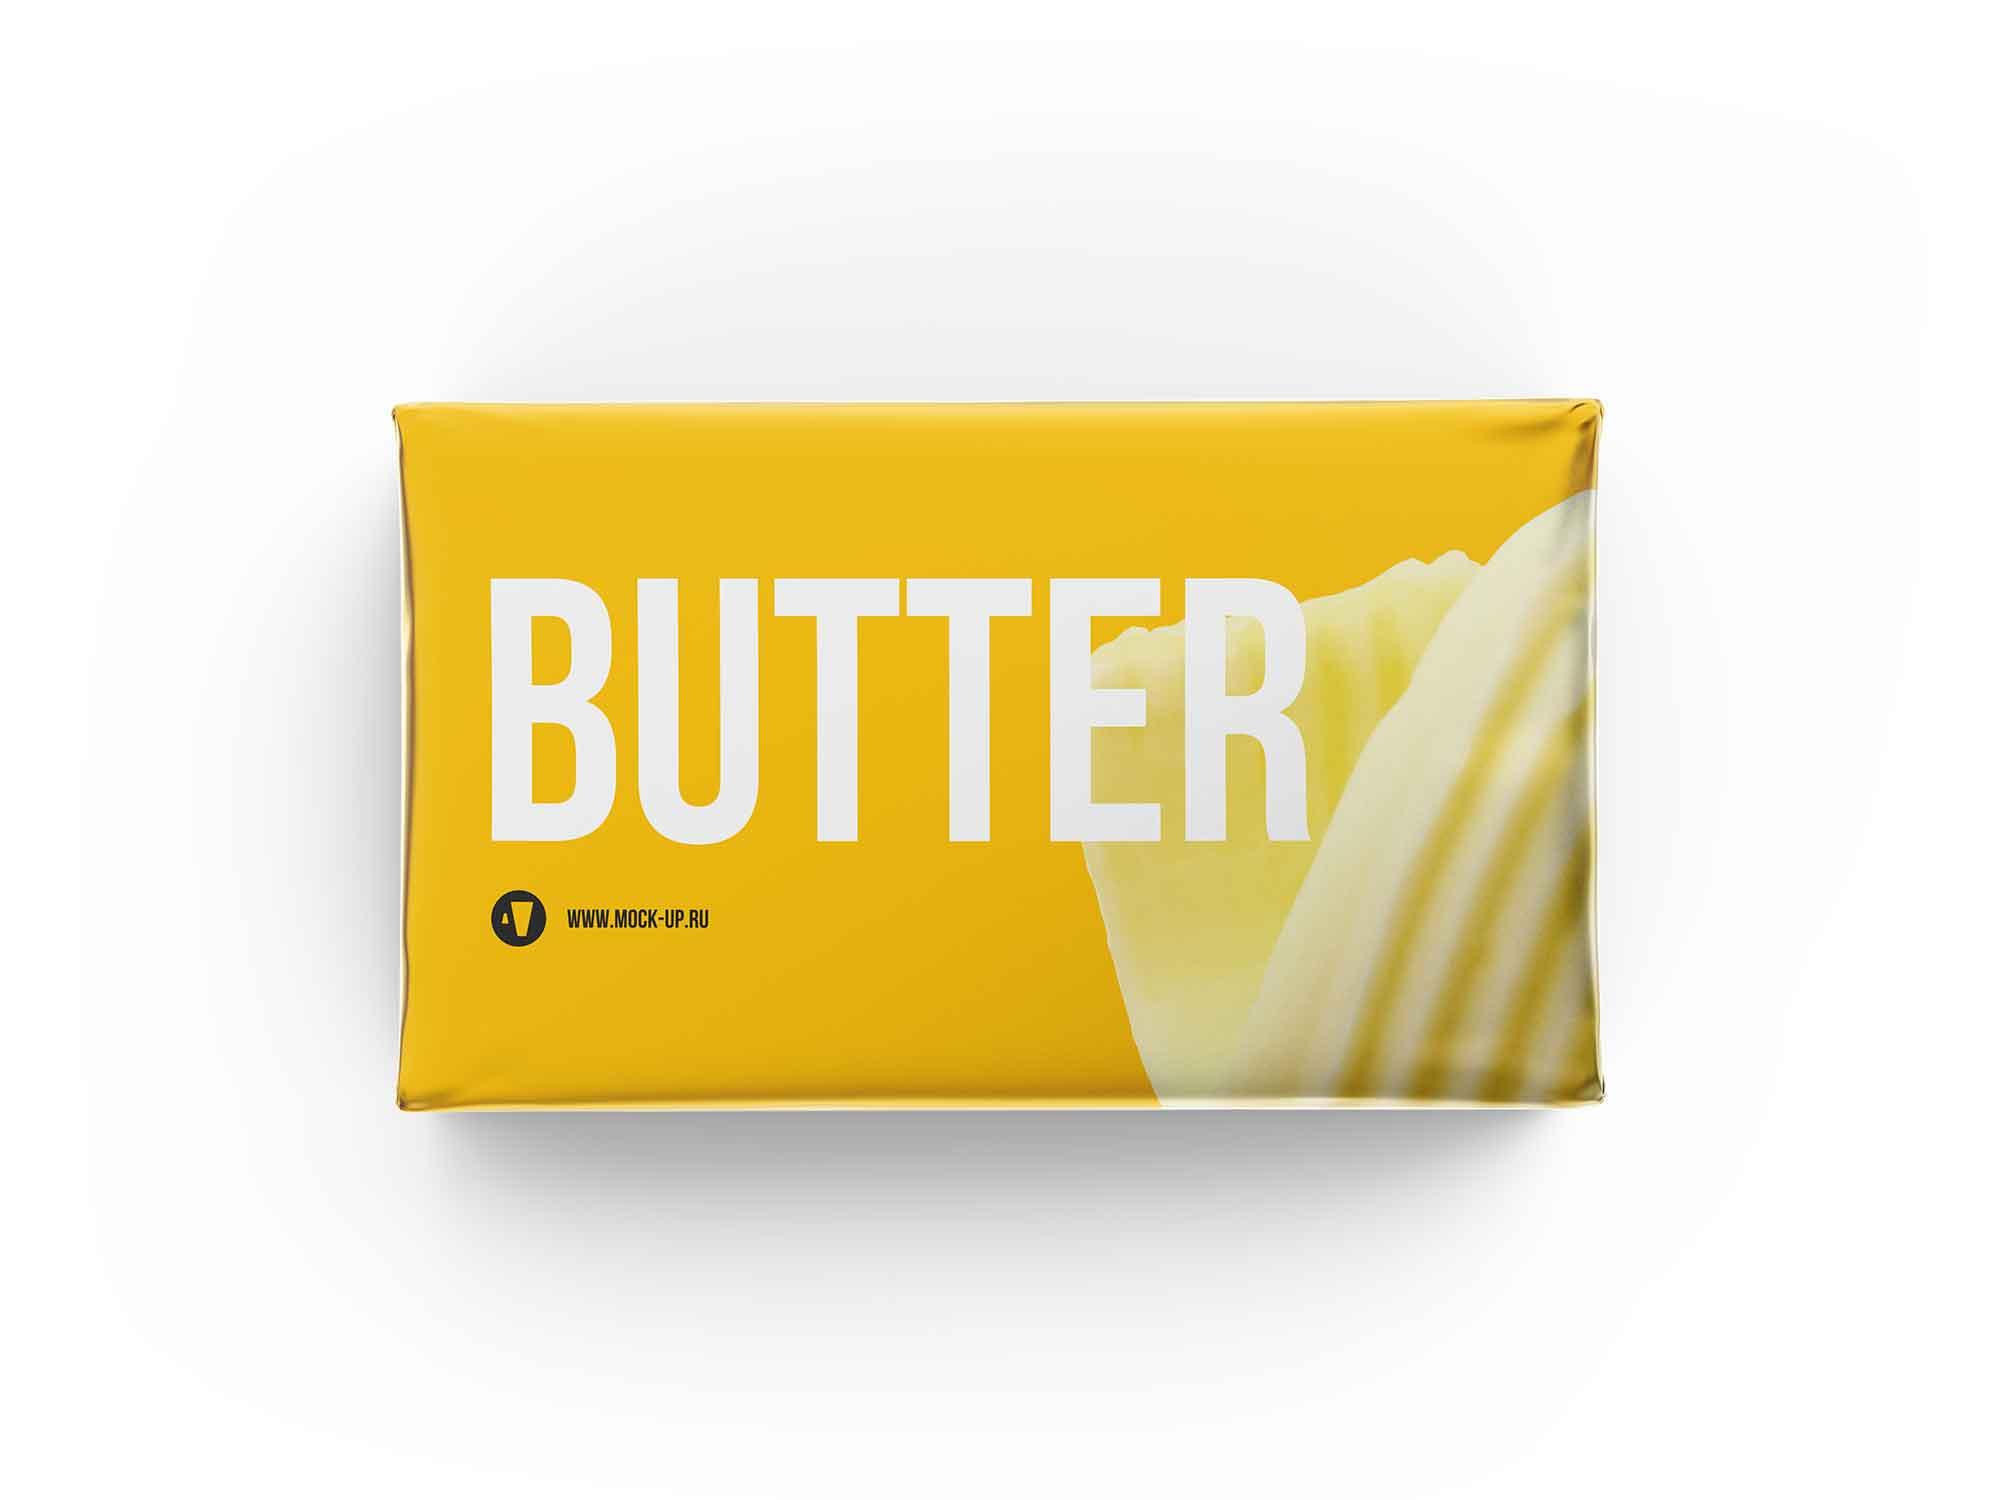 Butter Block Packaging Mockup